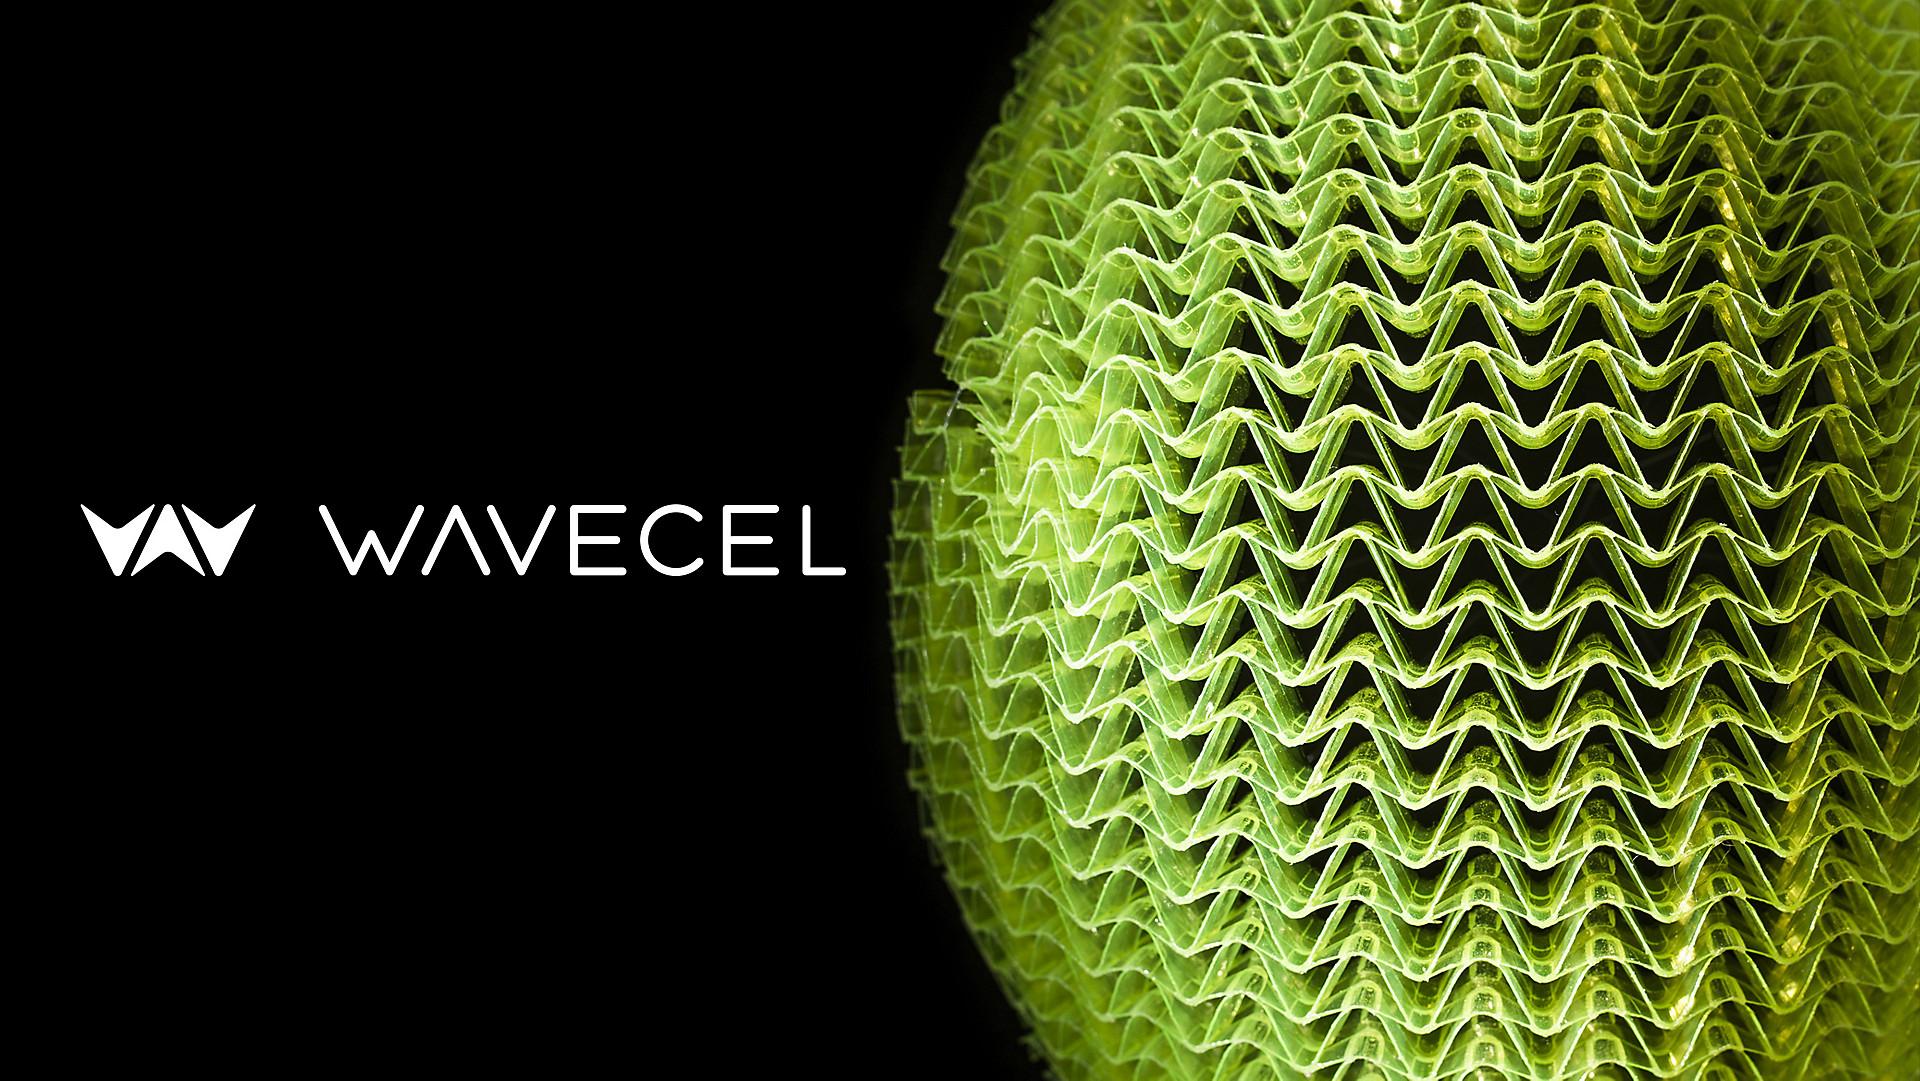 What is WaveCel?